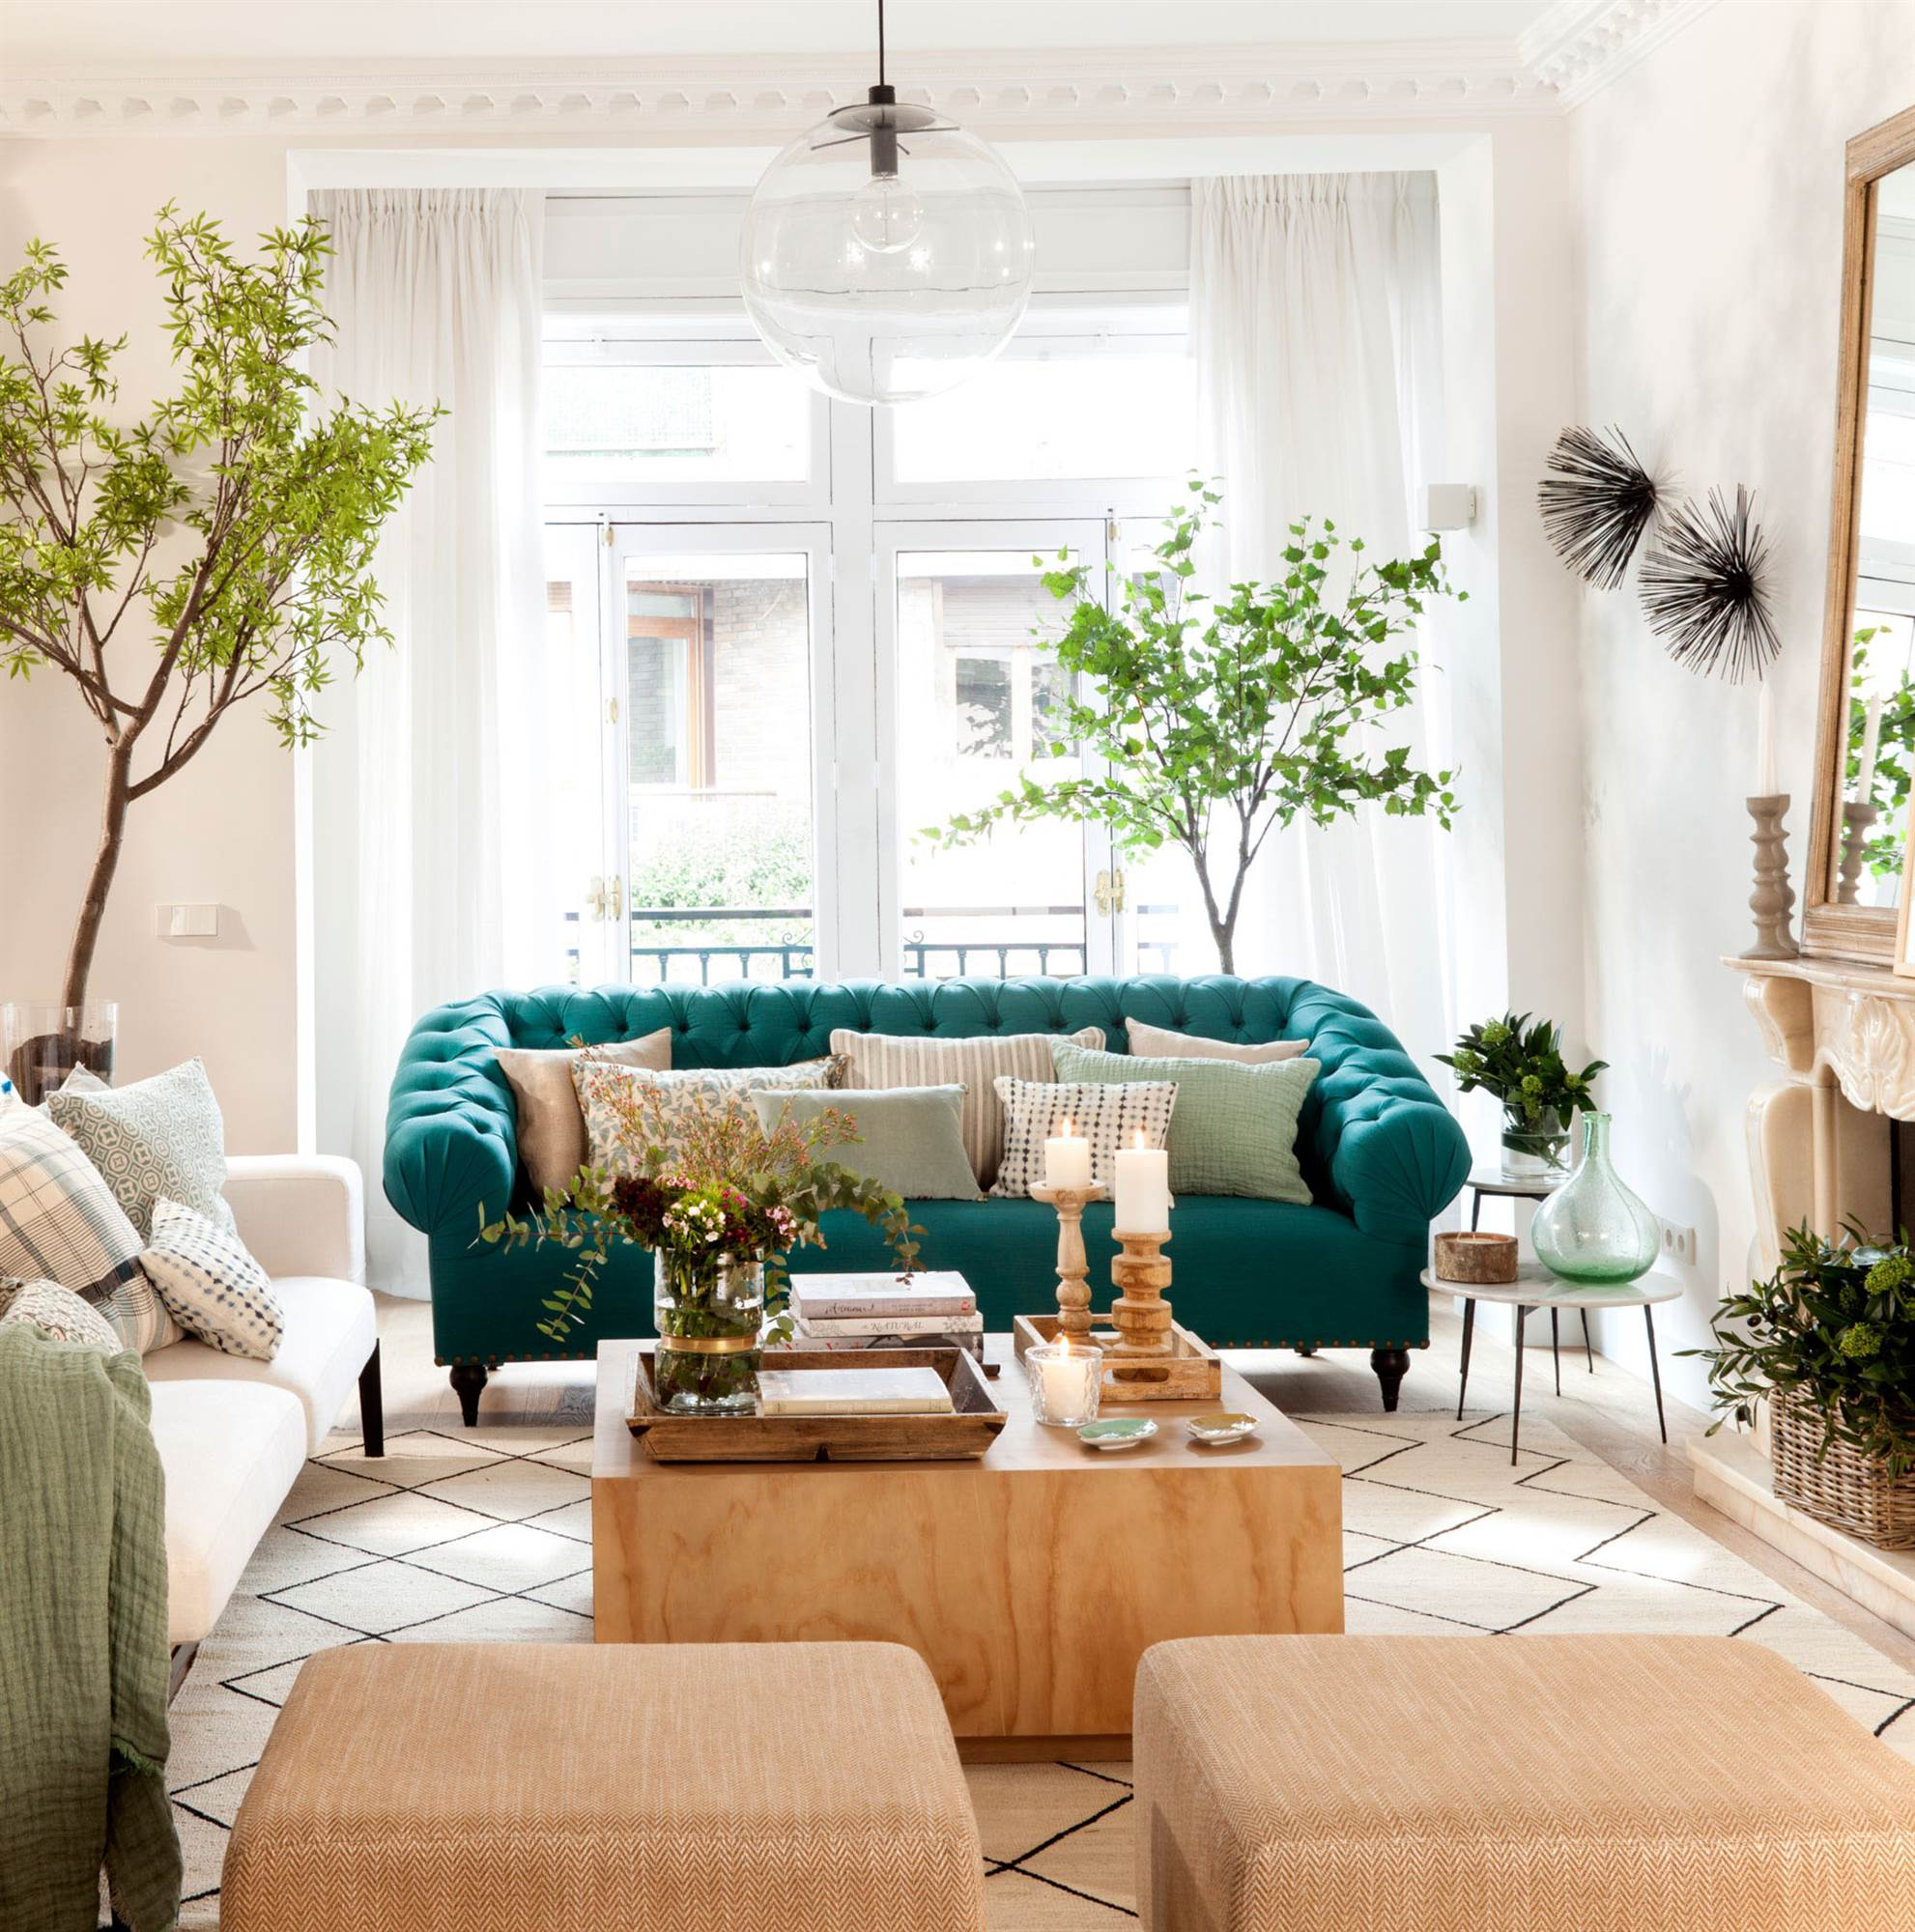 ideas de decoración de sala de sofá de cuero marrón Sof Chster